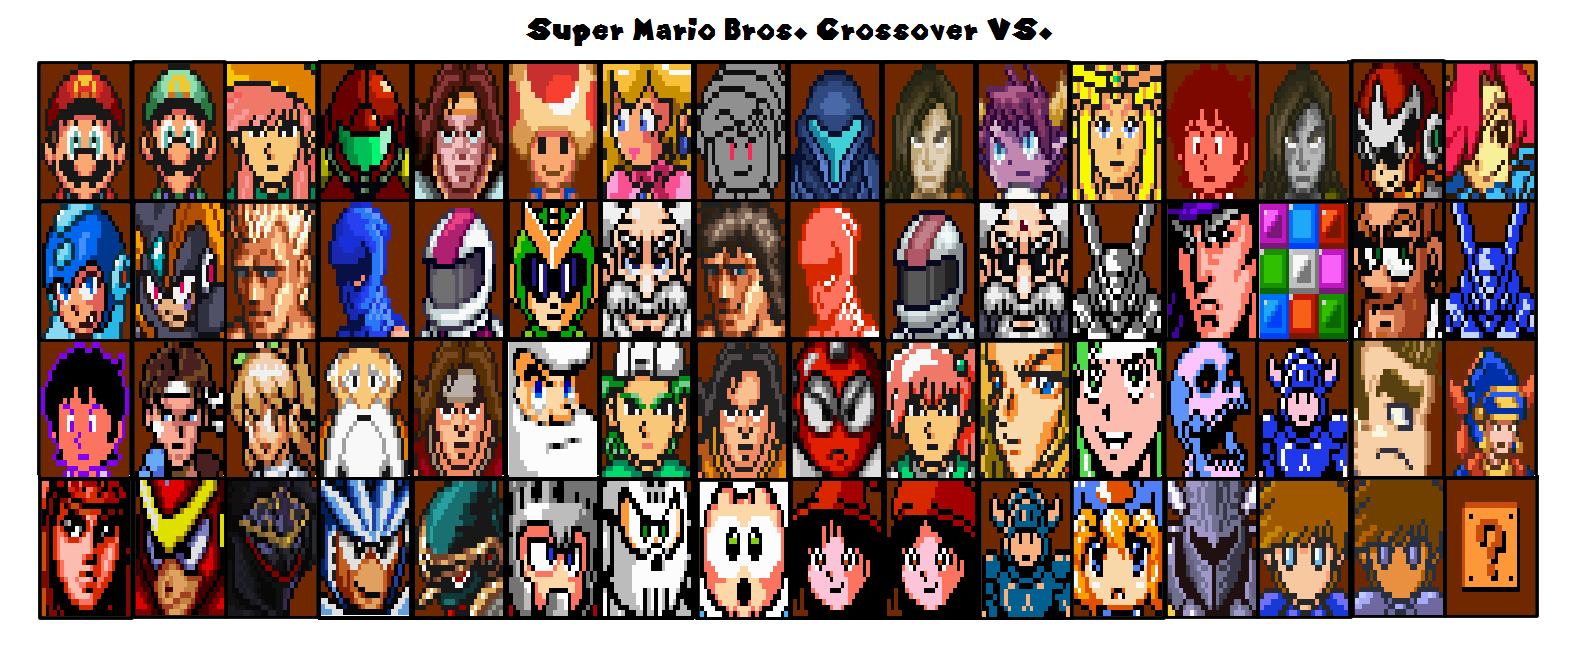 Super mario bros crossover vs by hboy333333 on deviantart